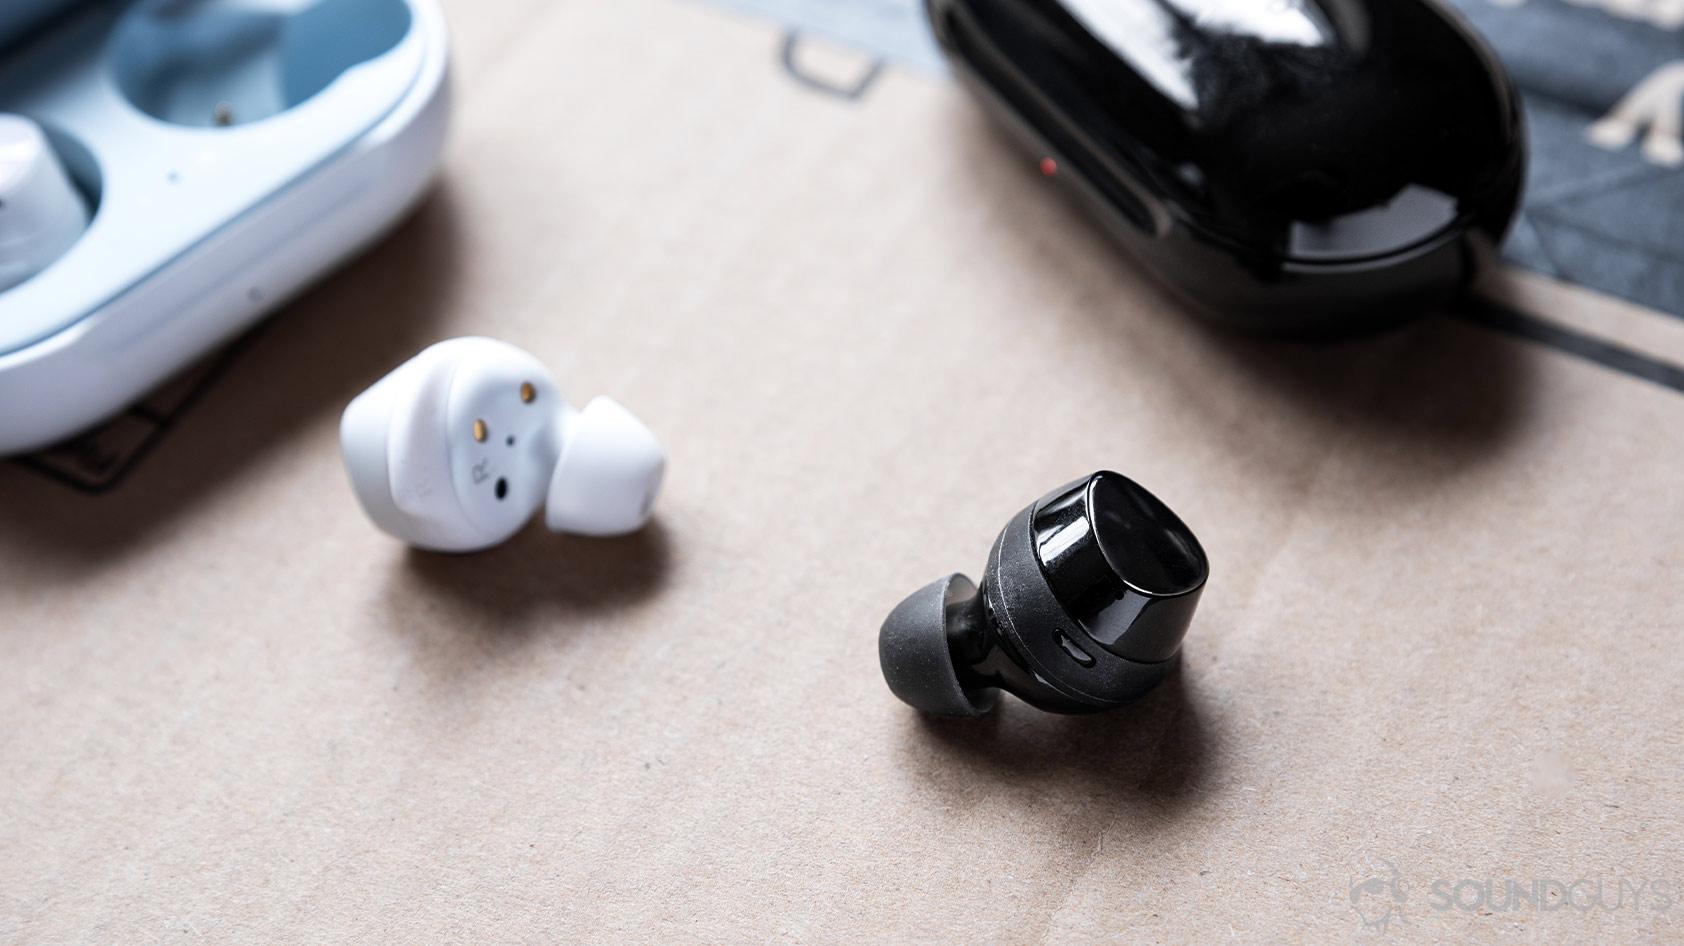 Samsung Galaxy Buds Plus vs Galaxy Buds true wireless earbuds touch controls